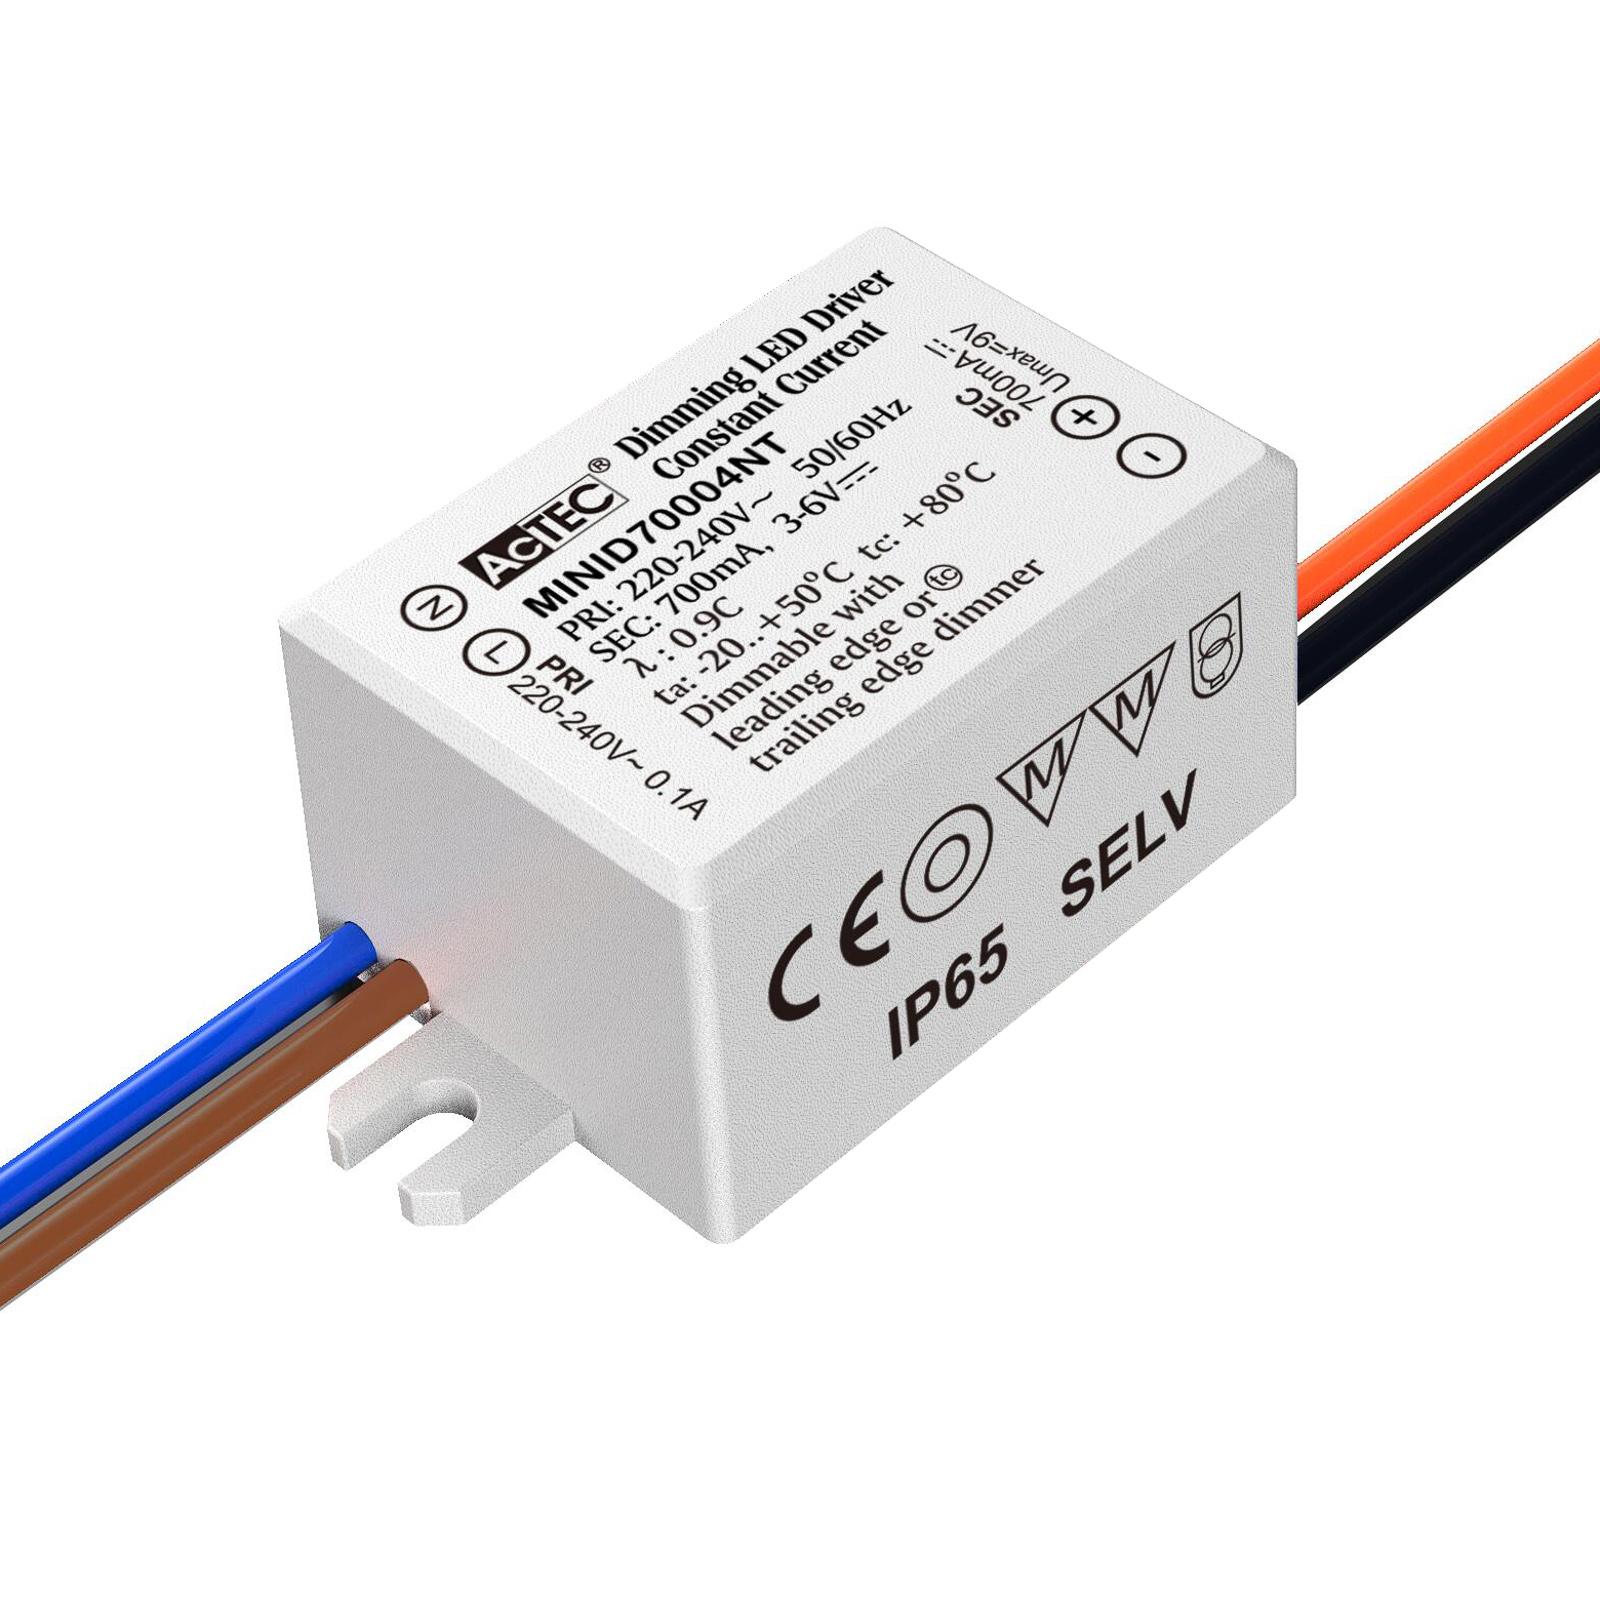 SLC Konstantstrom-Treiber 3 - 6 V, 3 - 6 W